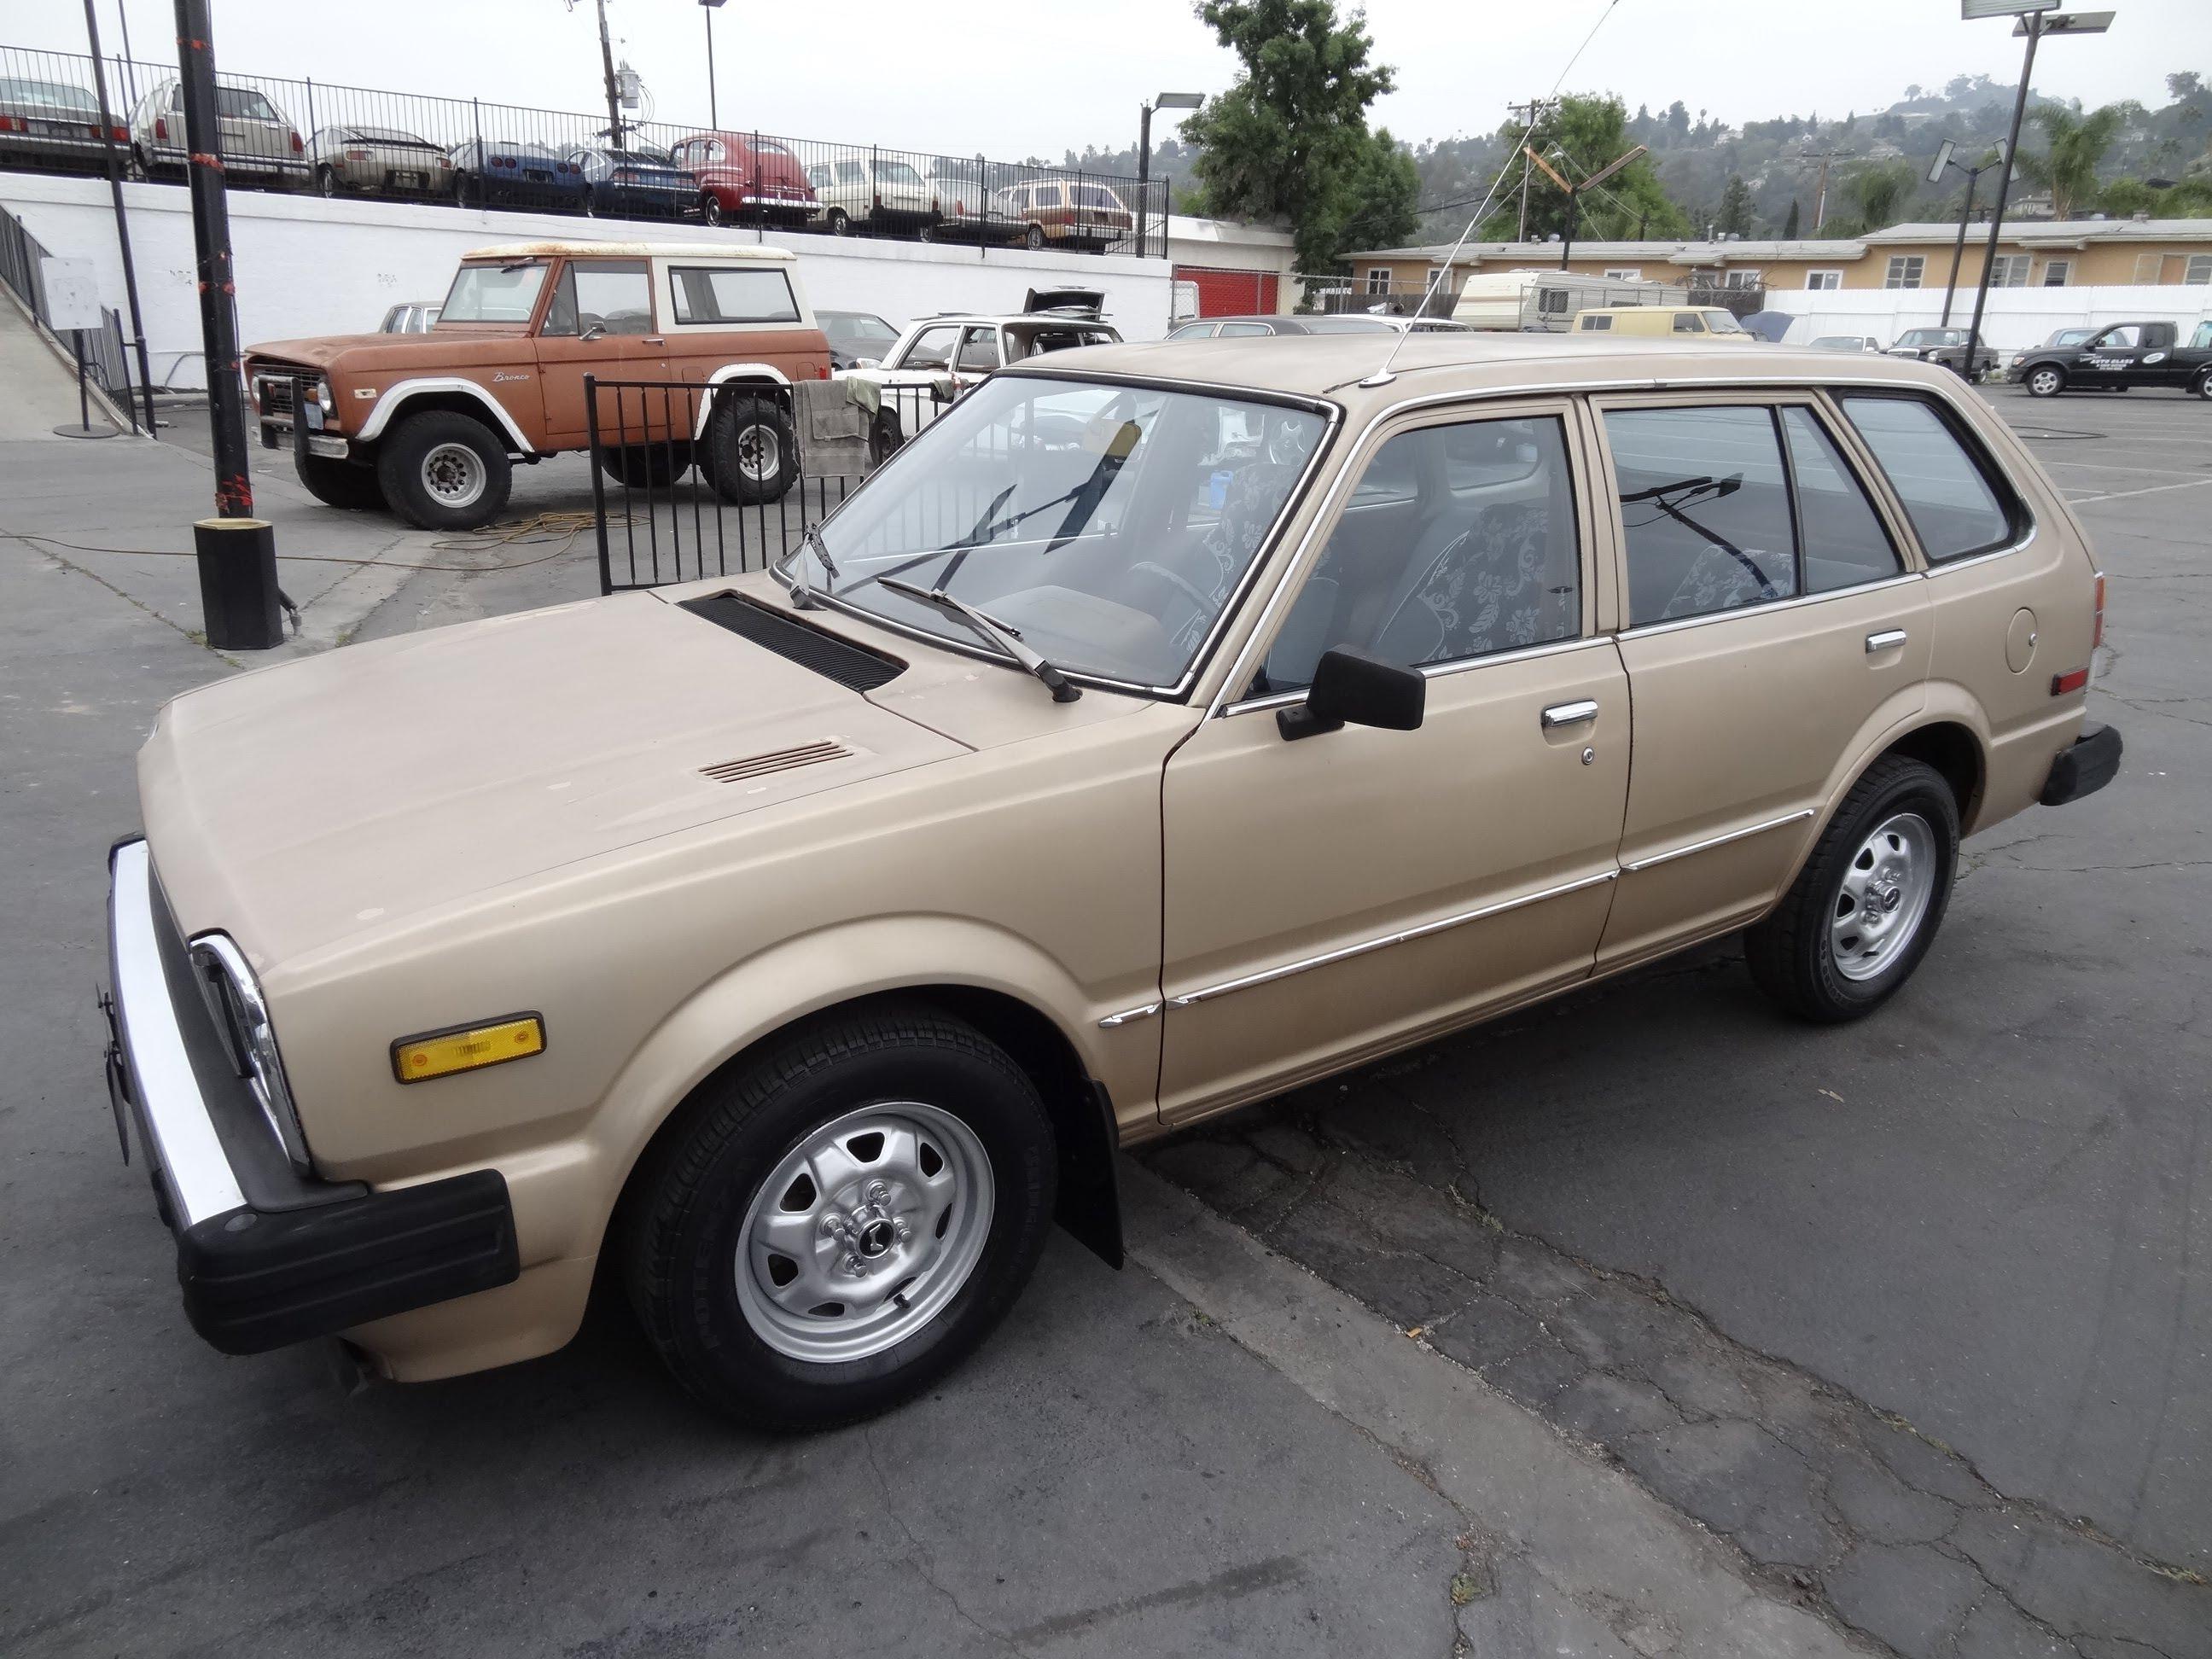 Honda Civic Ii 1979 1983 Station Wagon 5 Door Outstanding Cars 1970 Cvcc 4